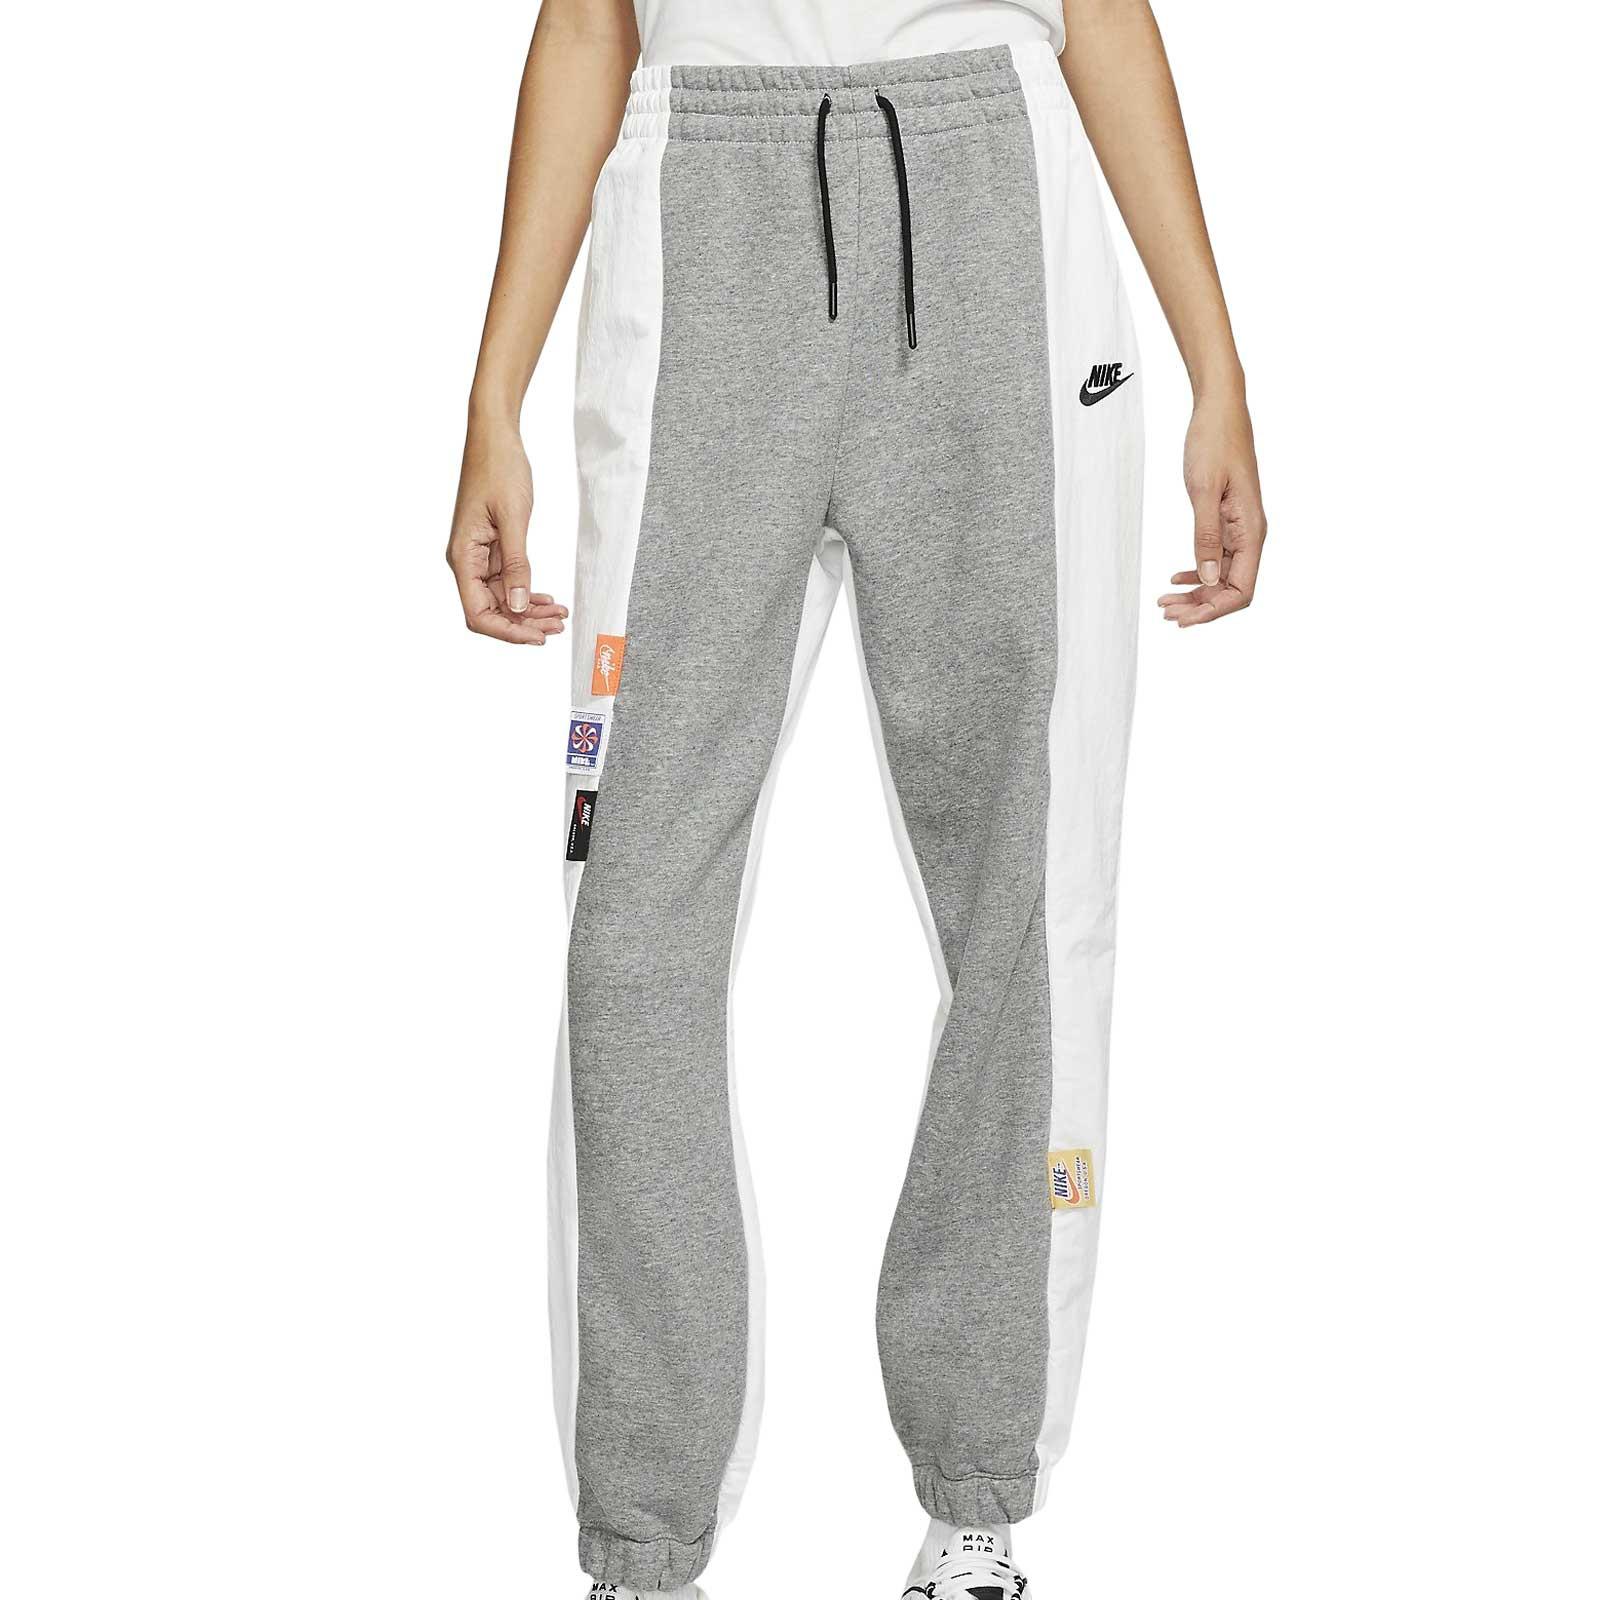 Pantalon Nike Mujer Gris 59 Descuento Gigarobot Net